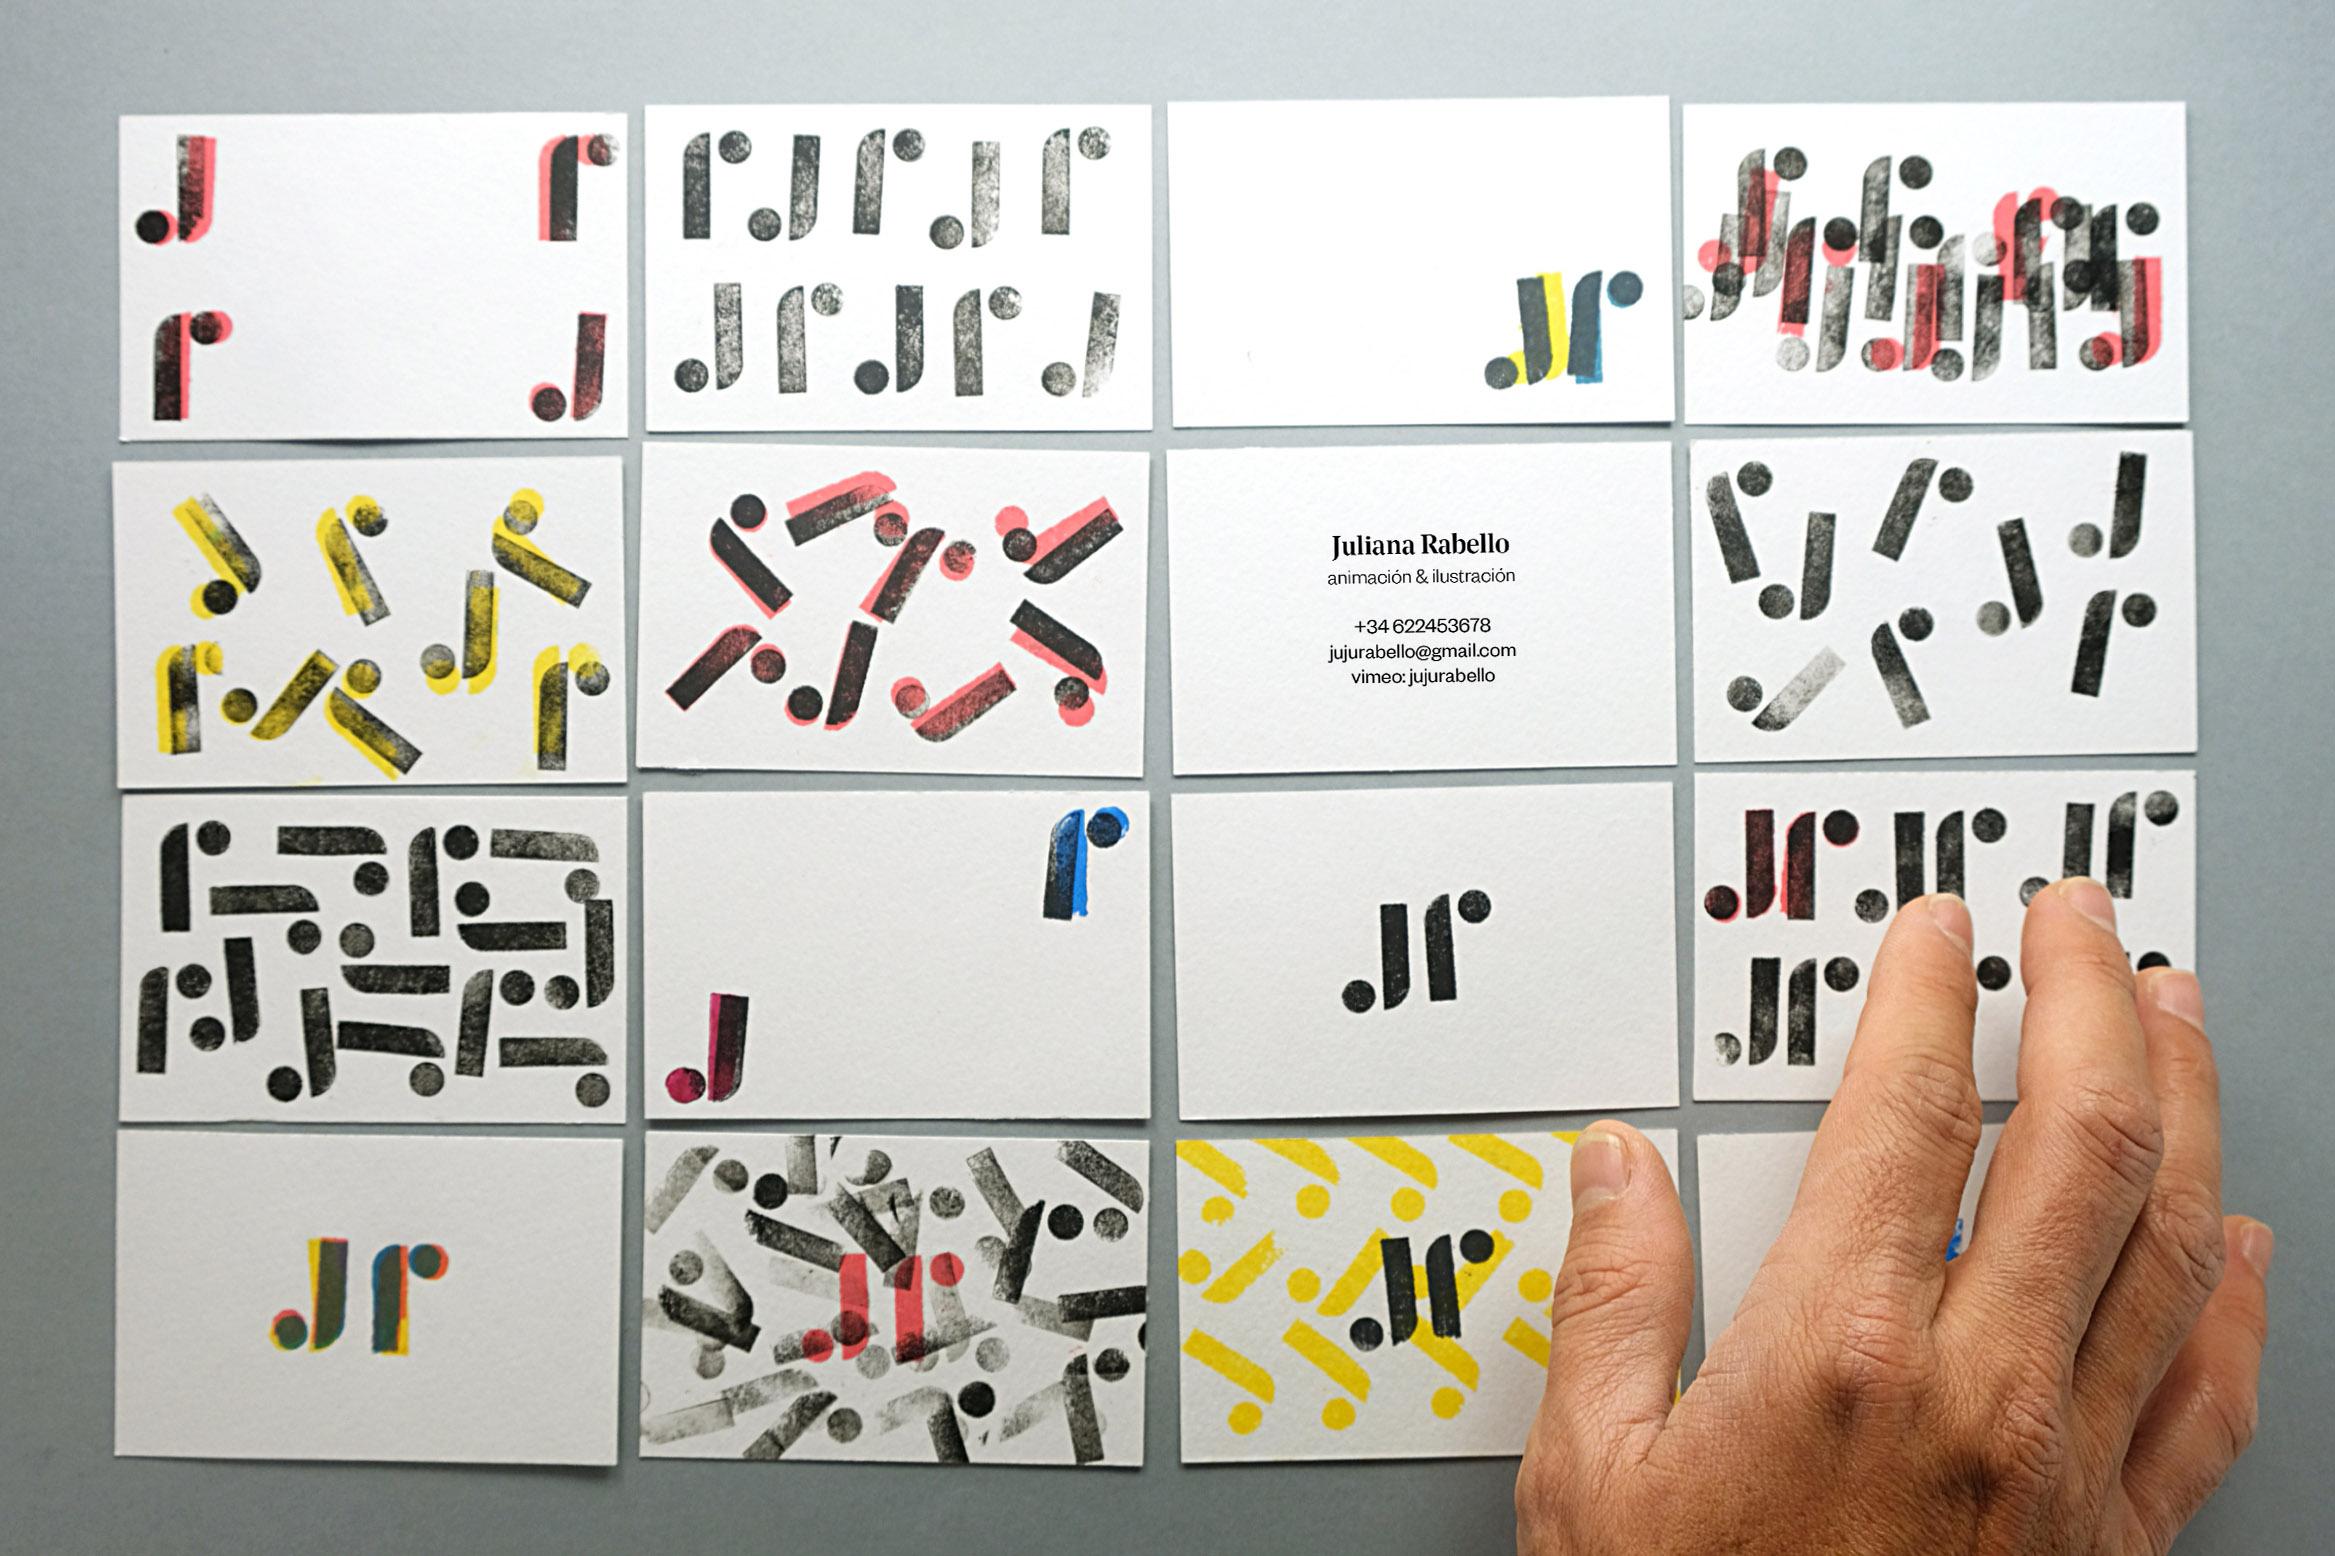 Cartao-cores-3-Juliana-Rabello-danielcavalcanti.com_